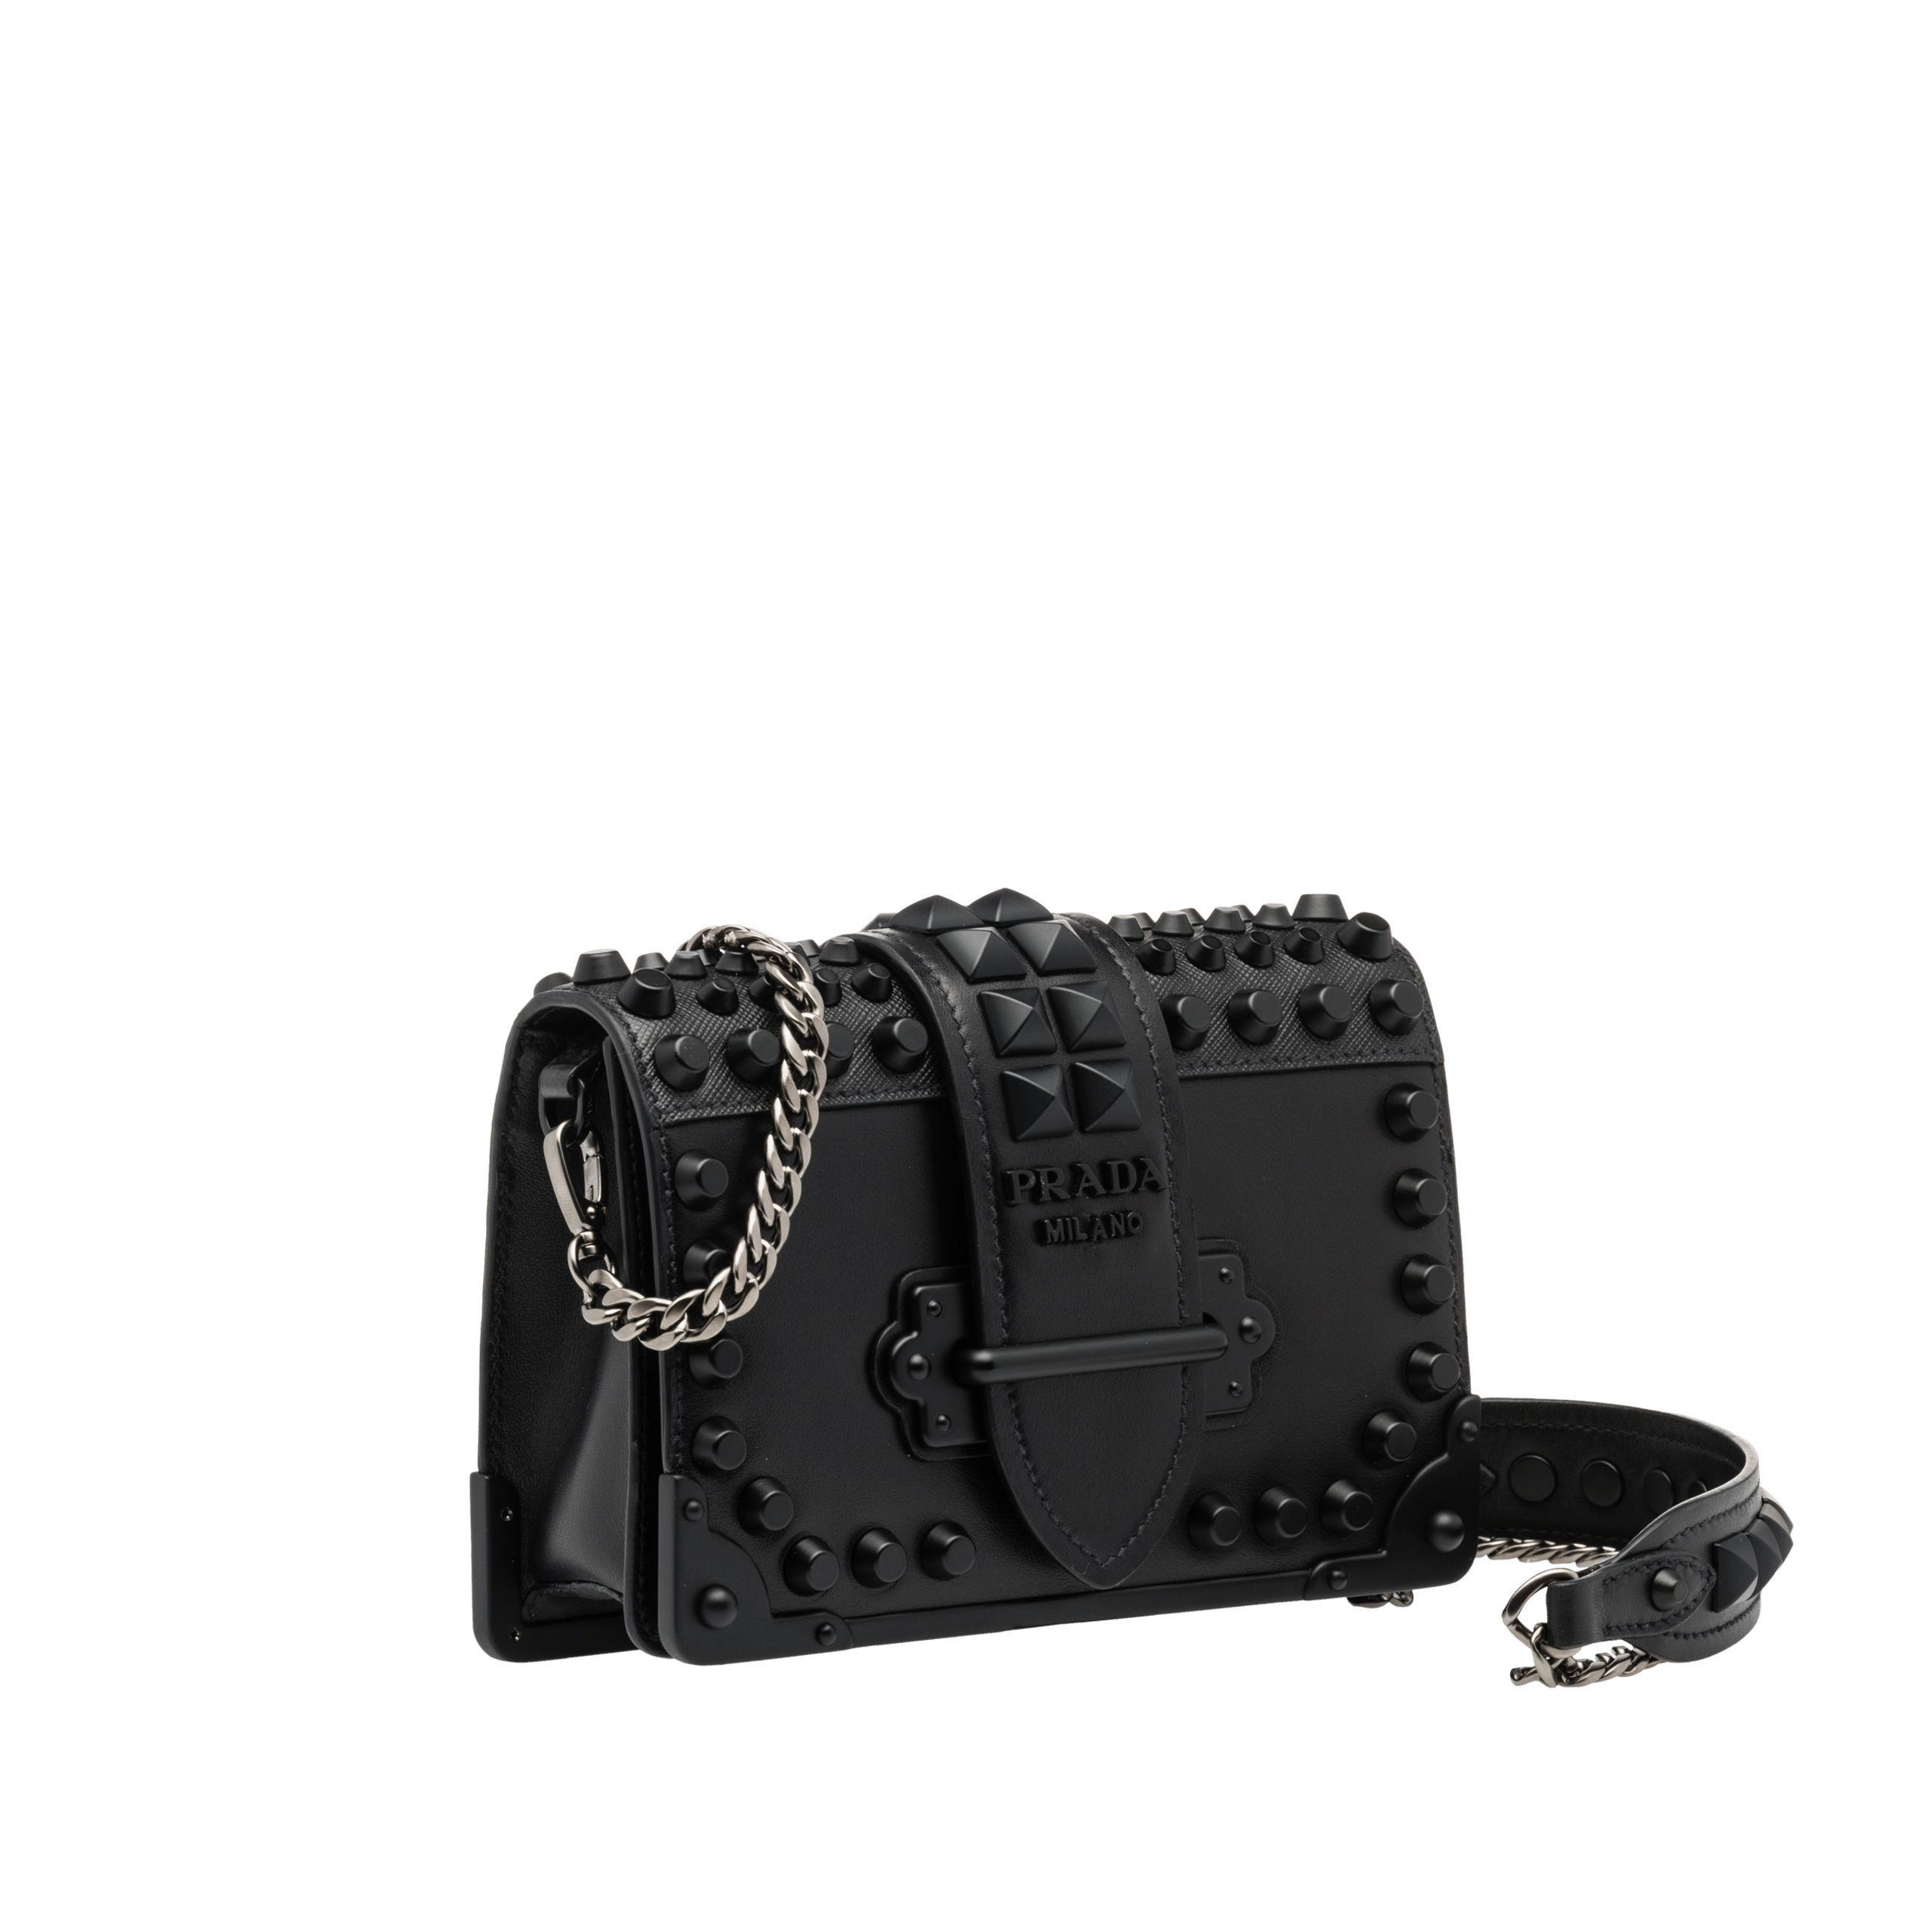 be68139577df Prada Cahier leather shoulder bag